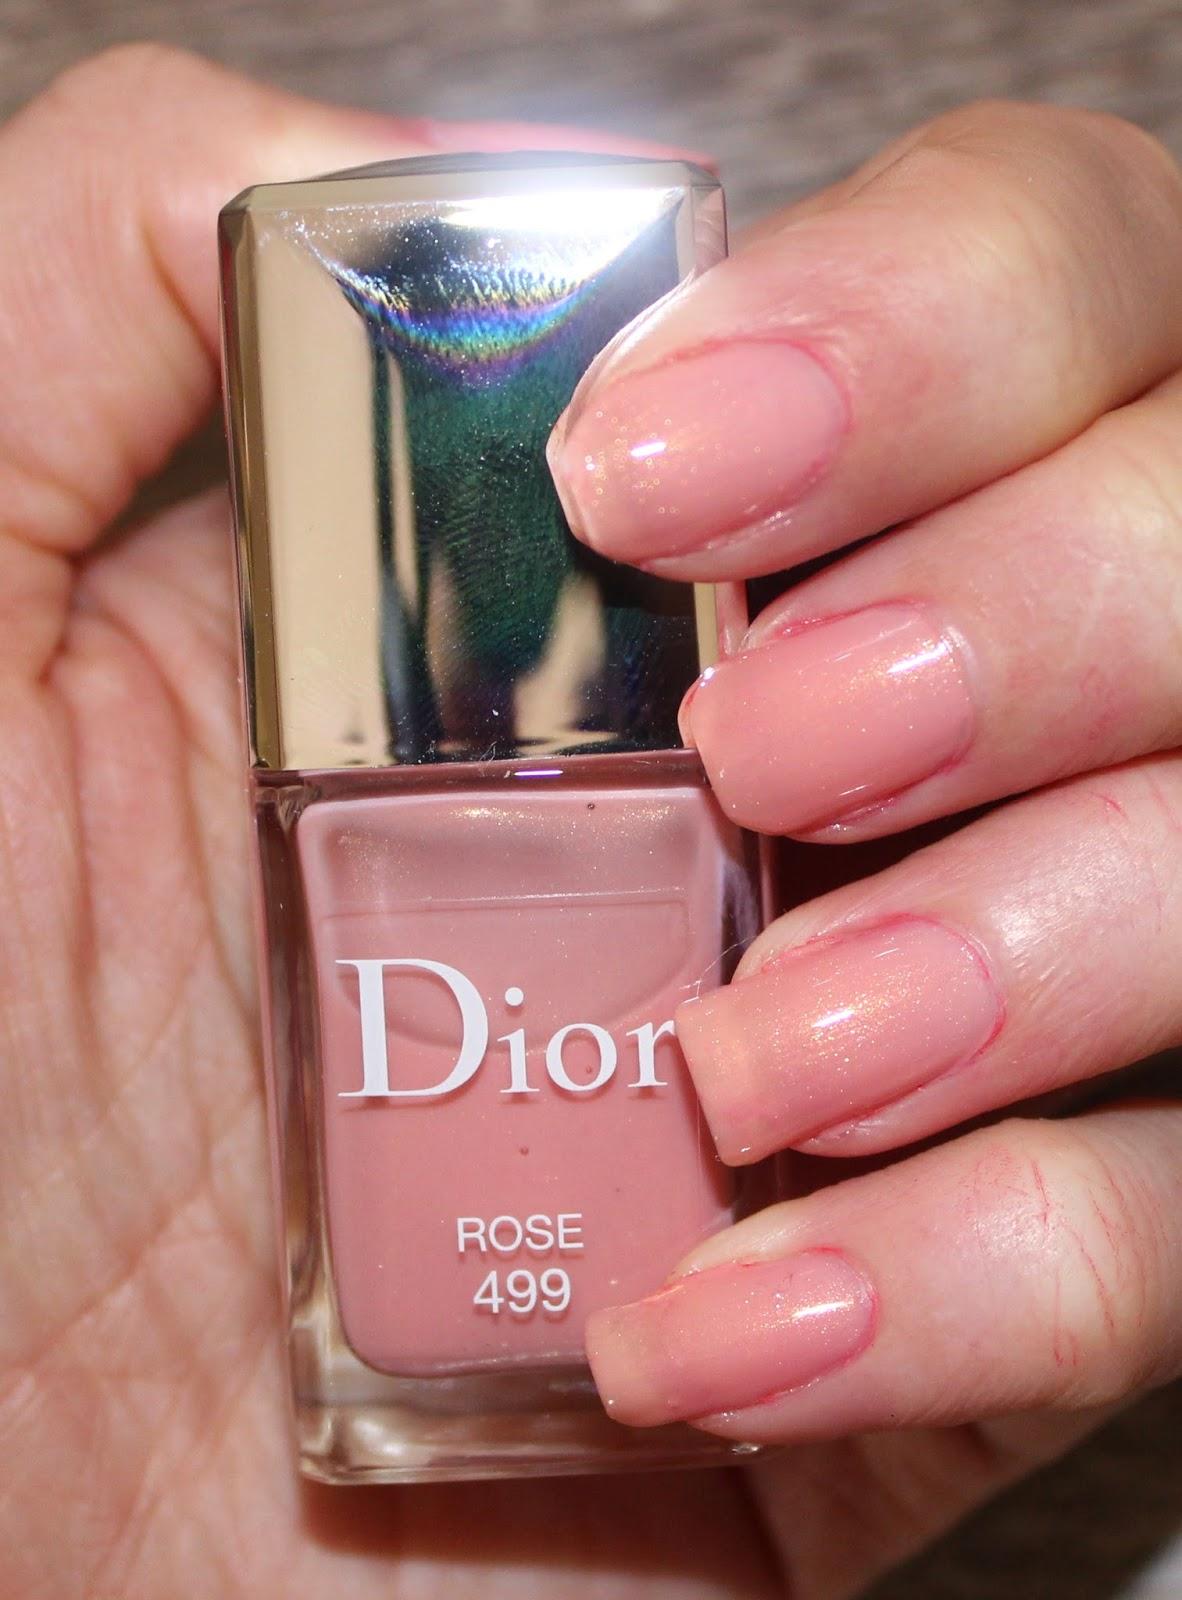 Dior Vernis in Rose